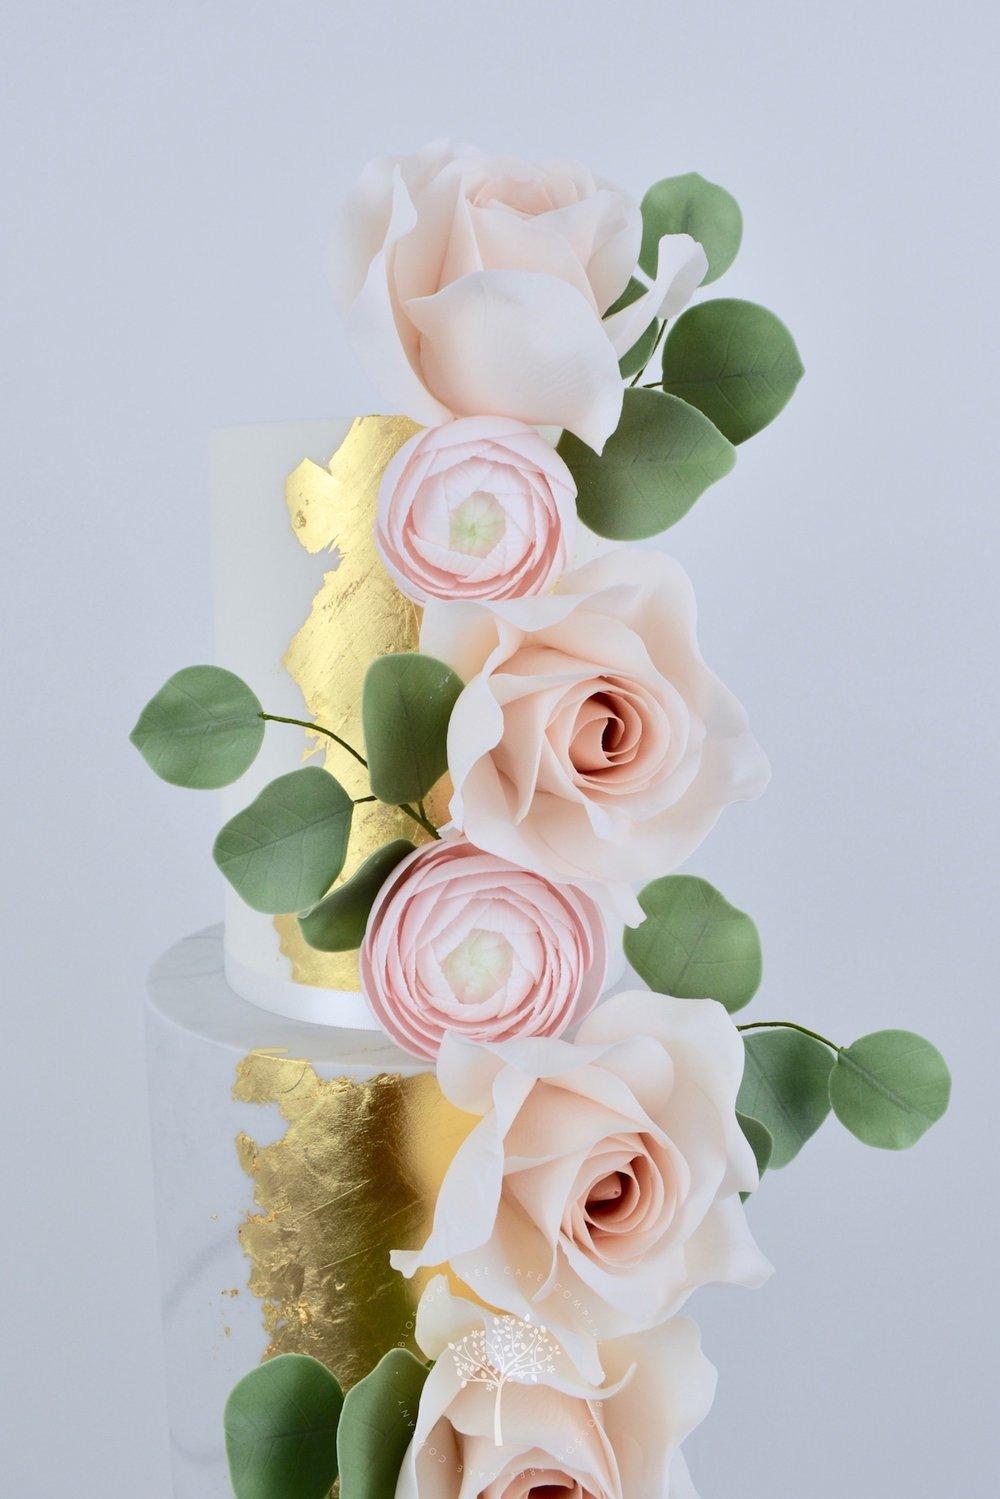 Rose Gold and Ranunculus wedding cake by Blossom Tree Cake Company Harrogate North Yorkshire - top sugar flowers.jpg